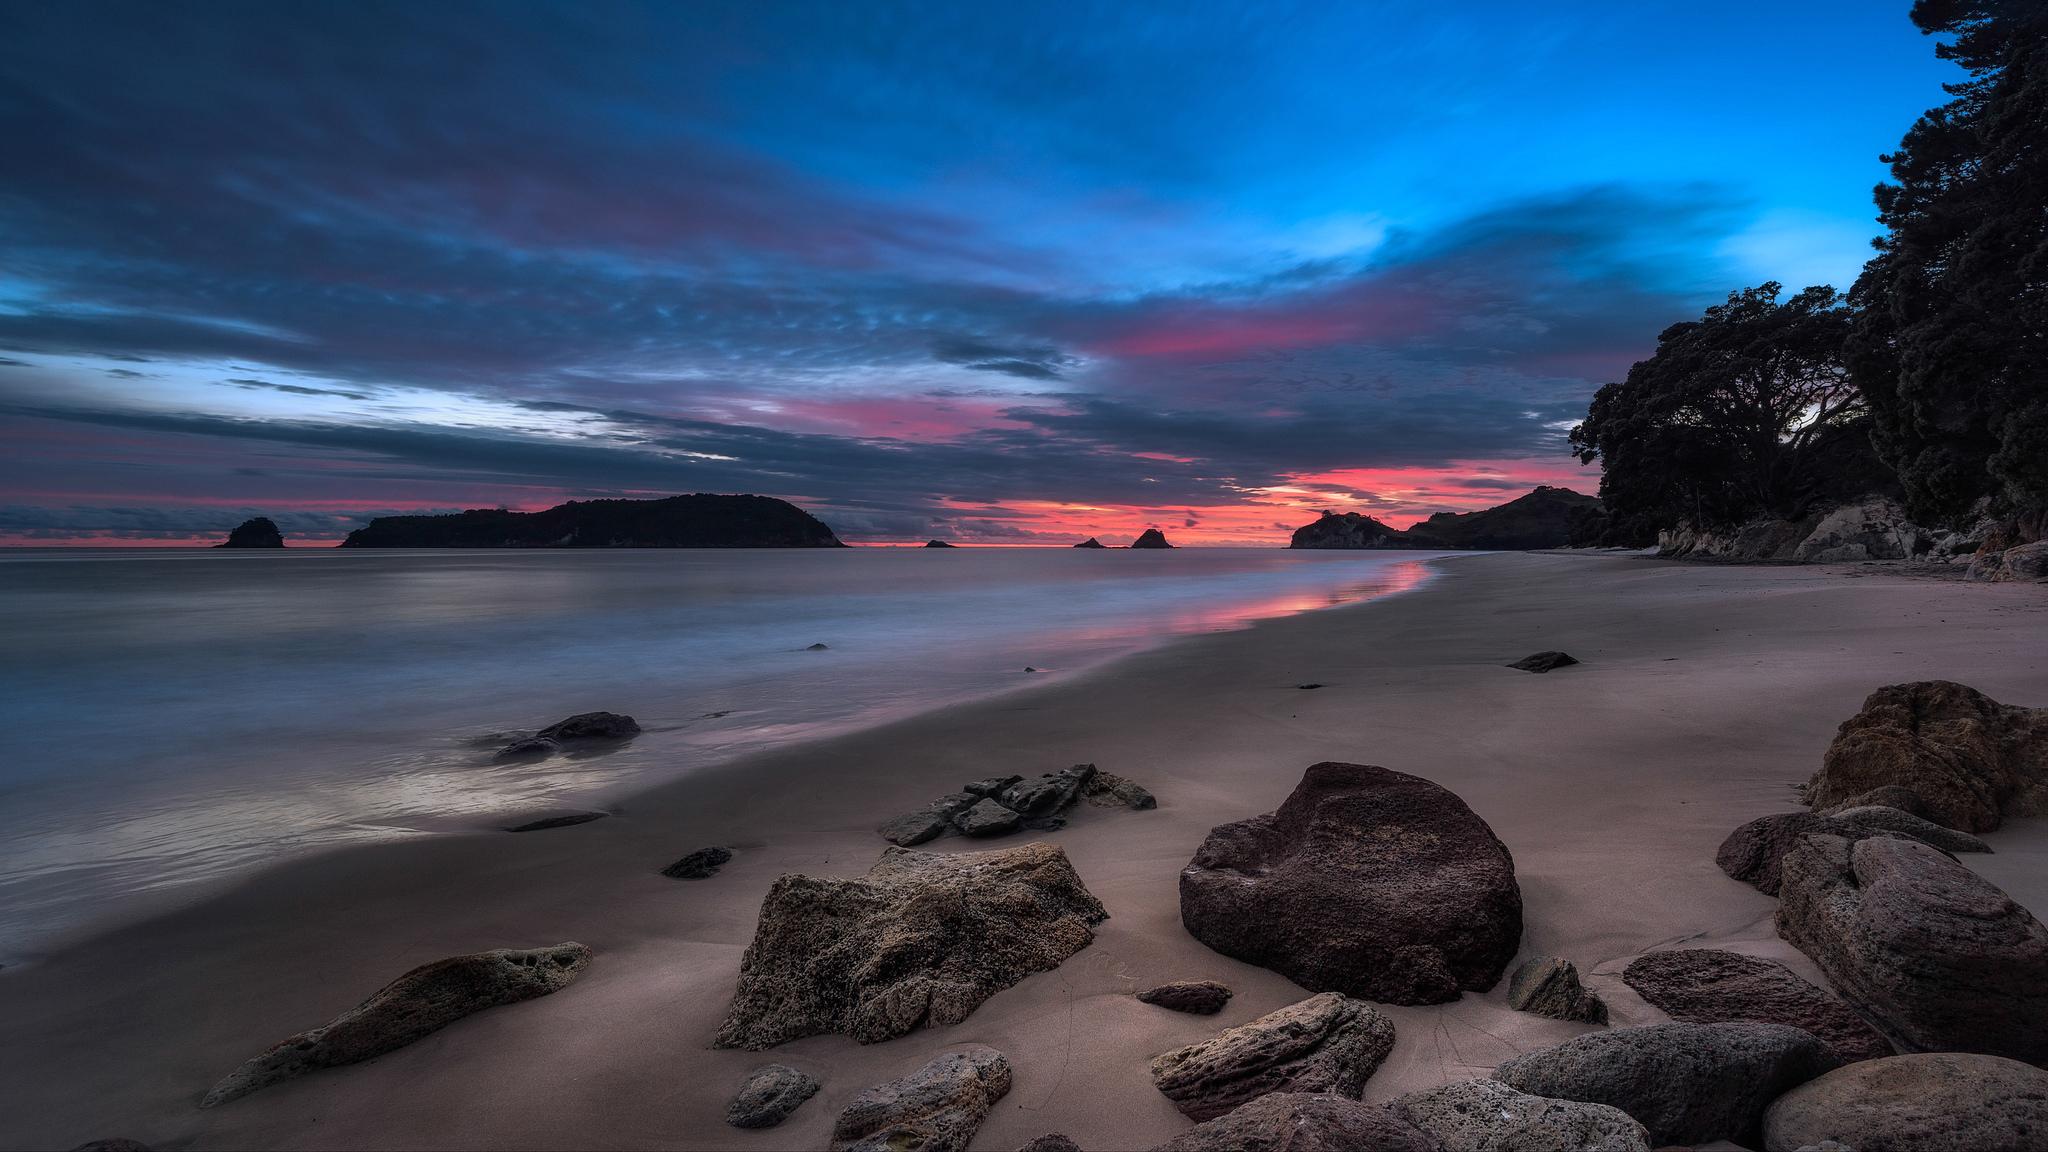 море берег камни закат sea shore stones sunset  № 1033169  скачать